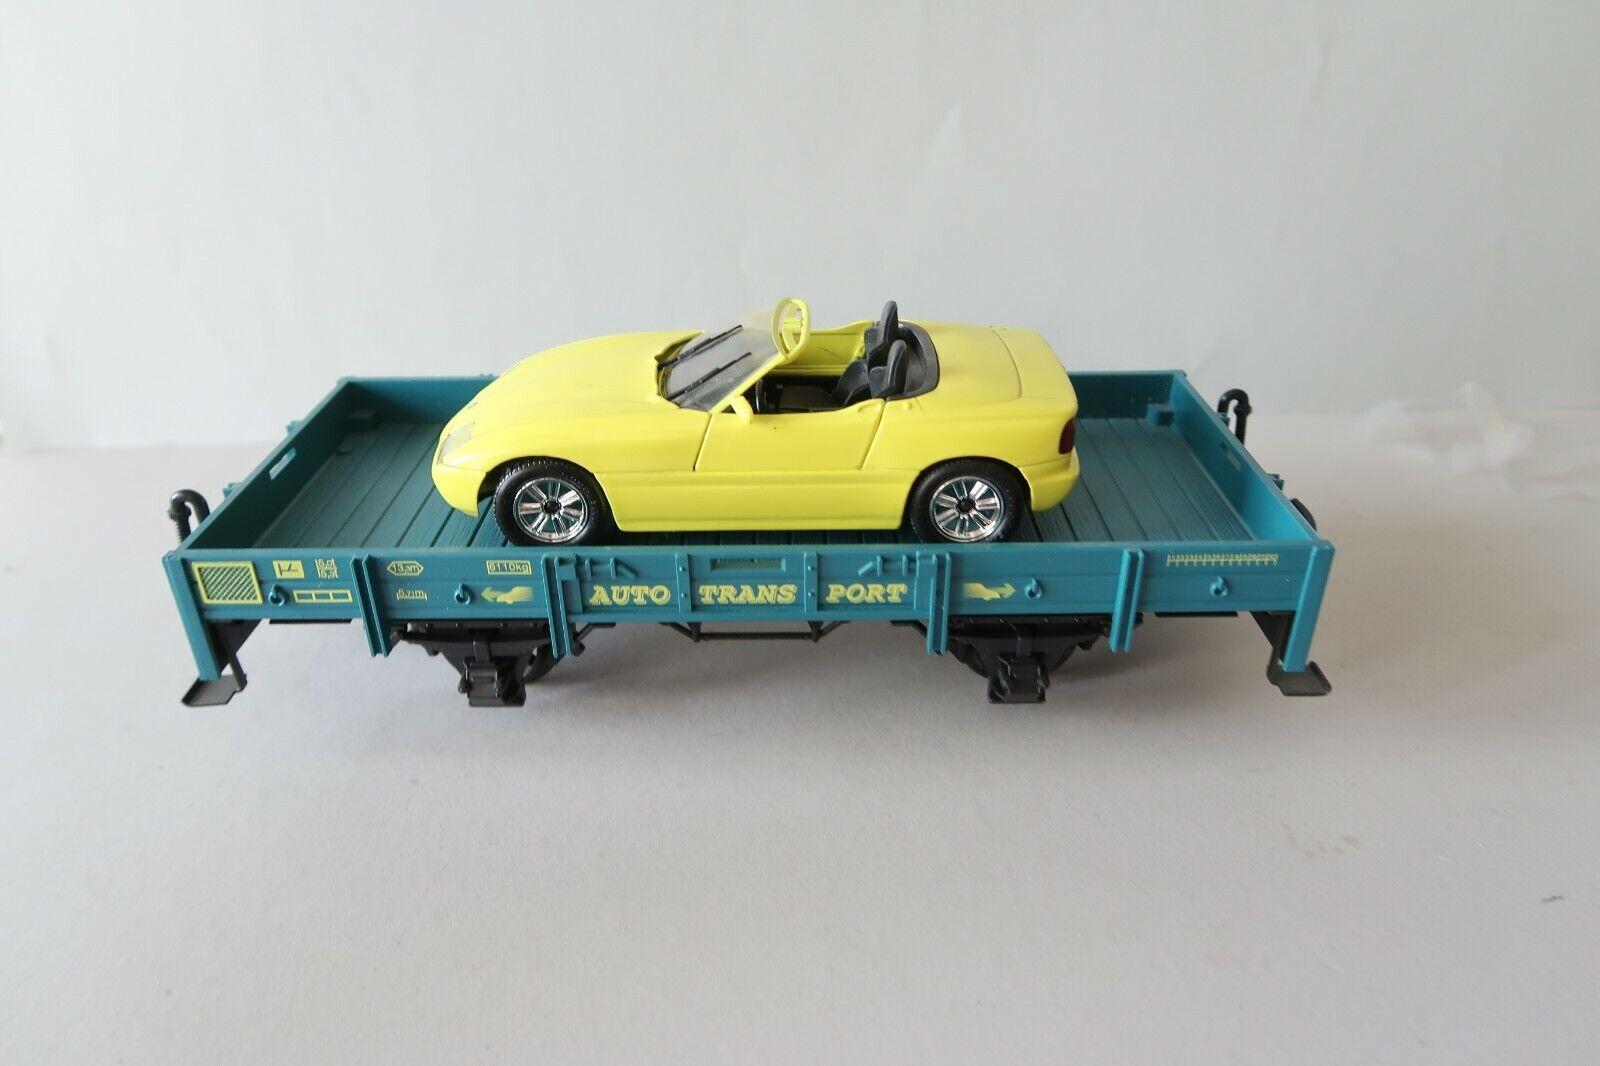 LGB Sur G DC 70520 Autotransportwagen mit BMW (DW074-35S4 0)